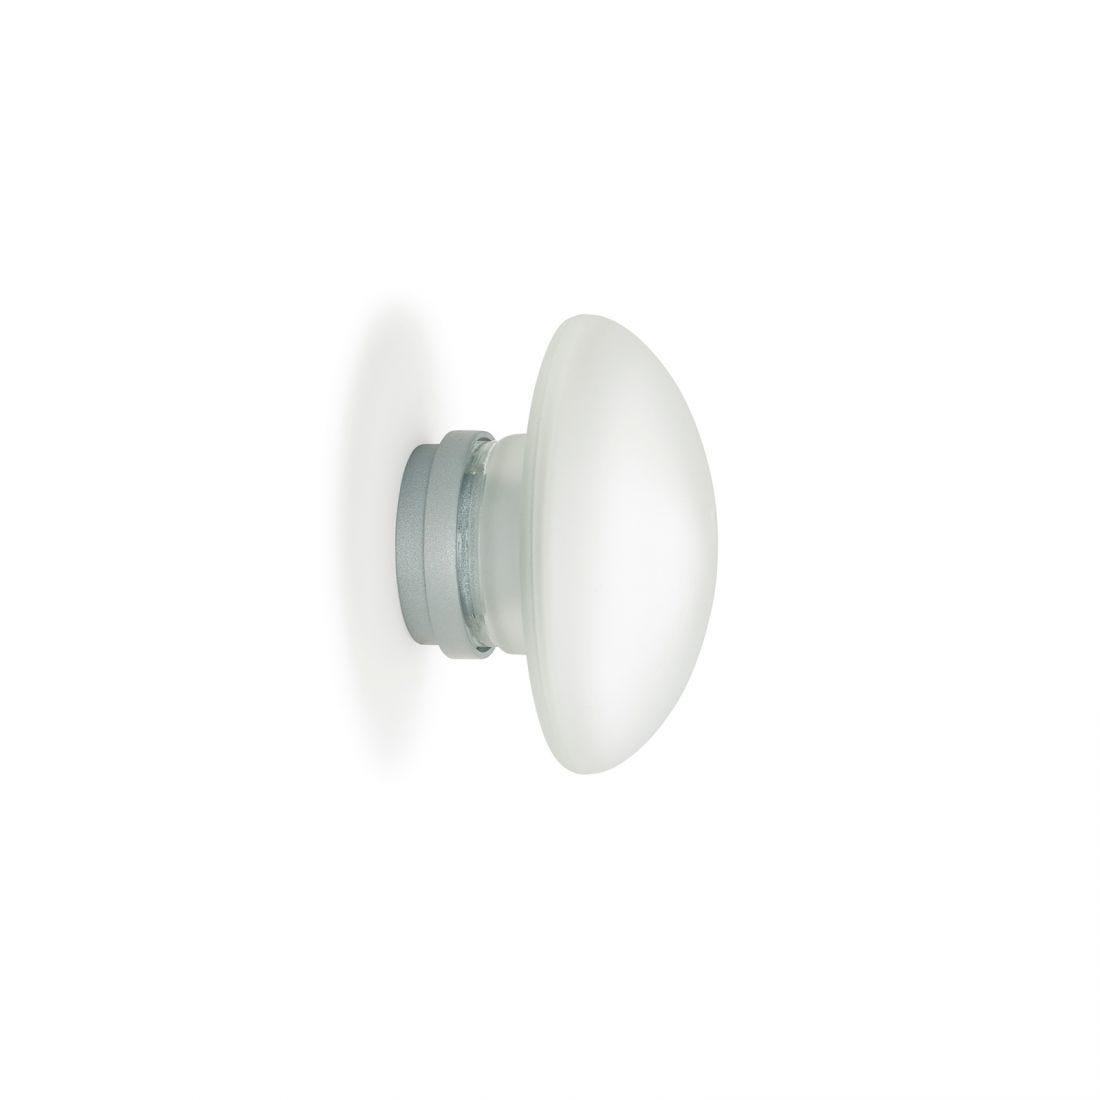 Fontana Arte Sillaba Medium Wand-Plafondlamp